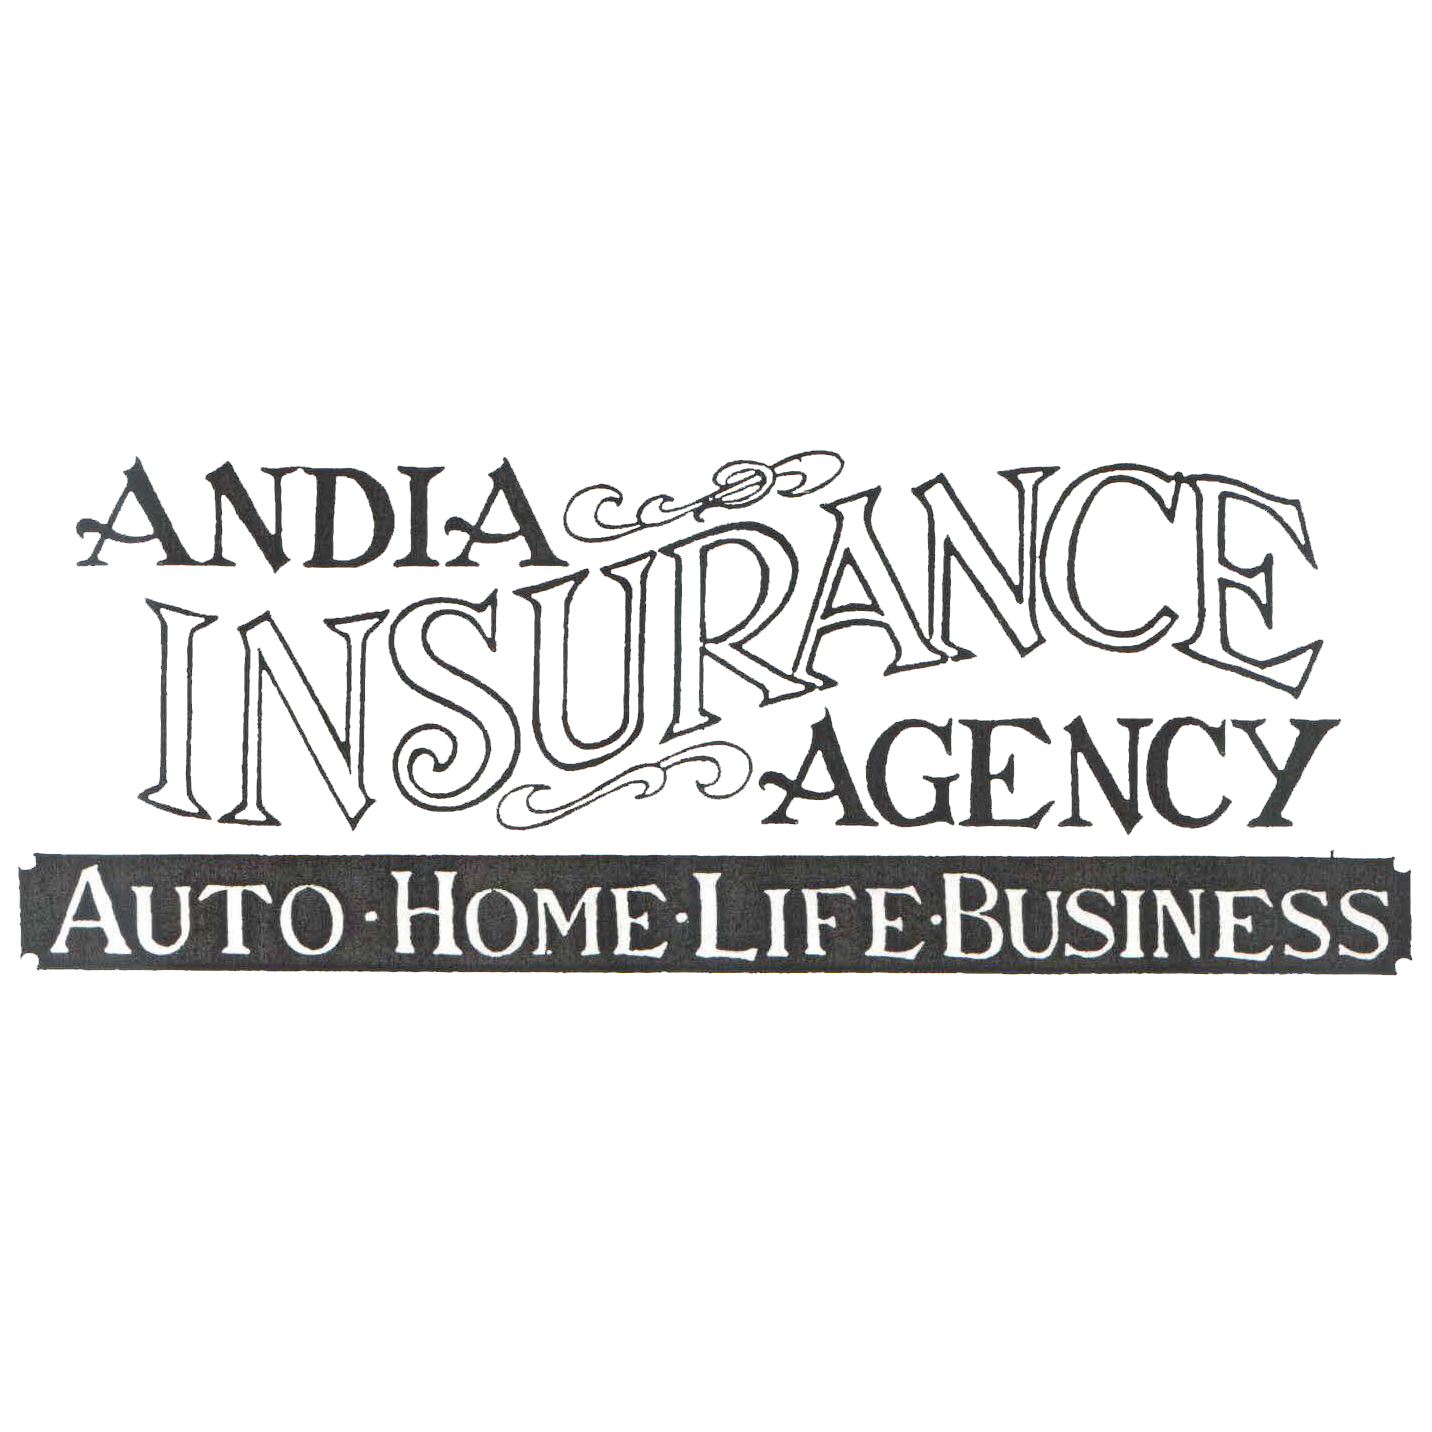 Andia Insurance Agency, Inc.